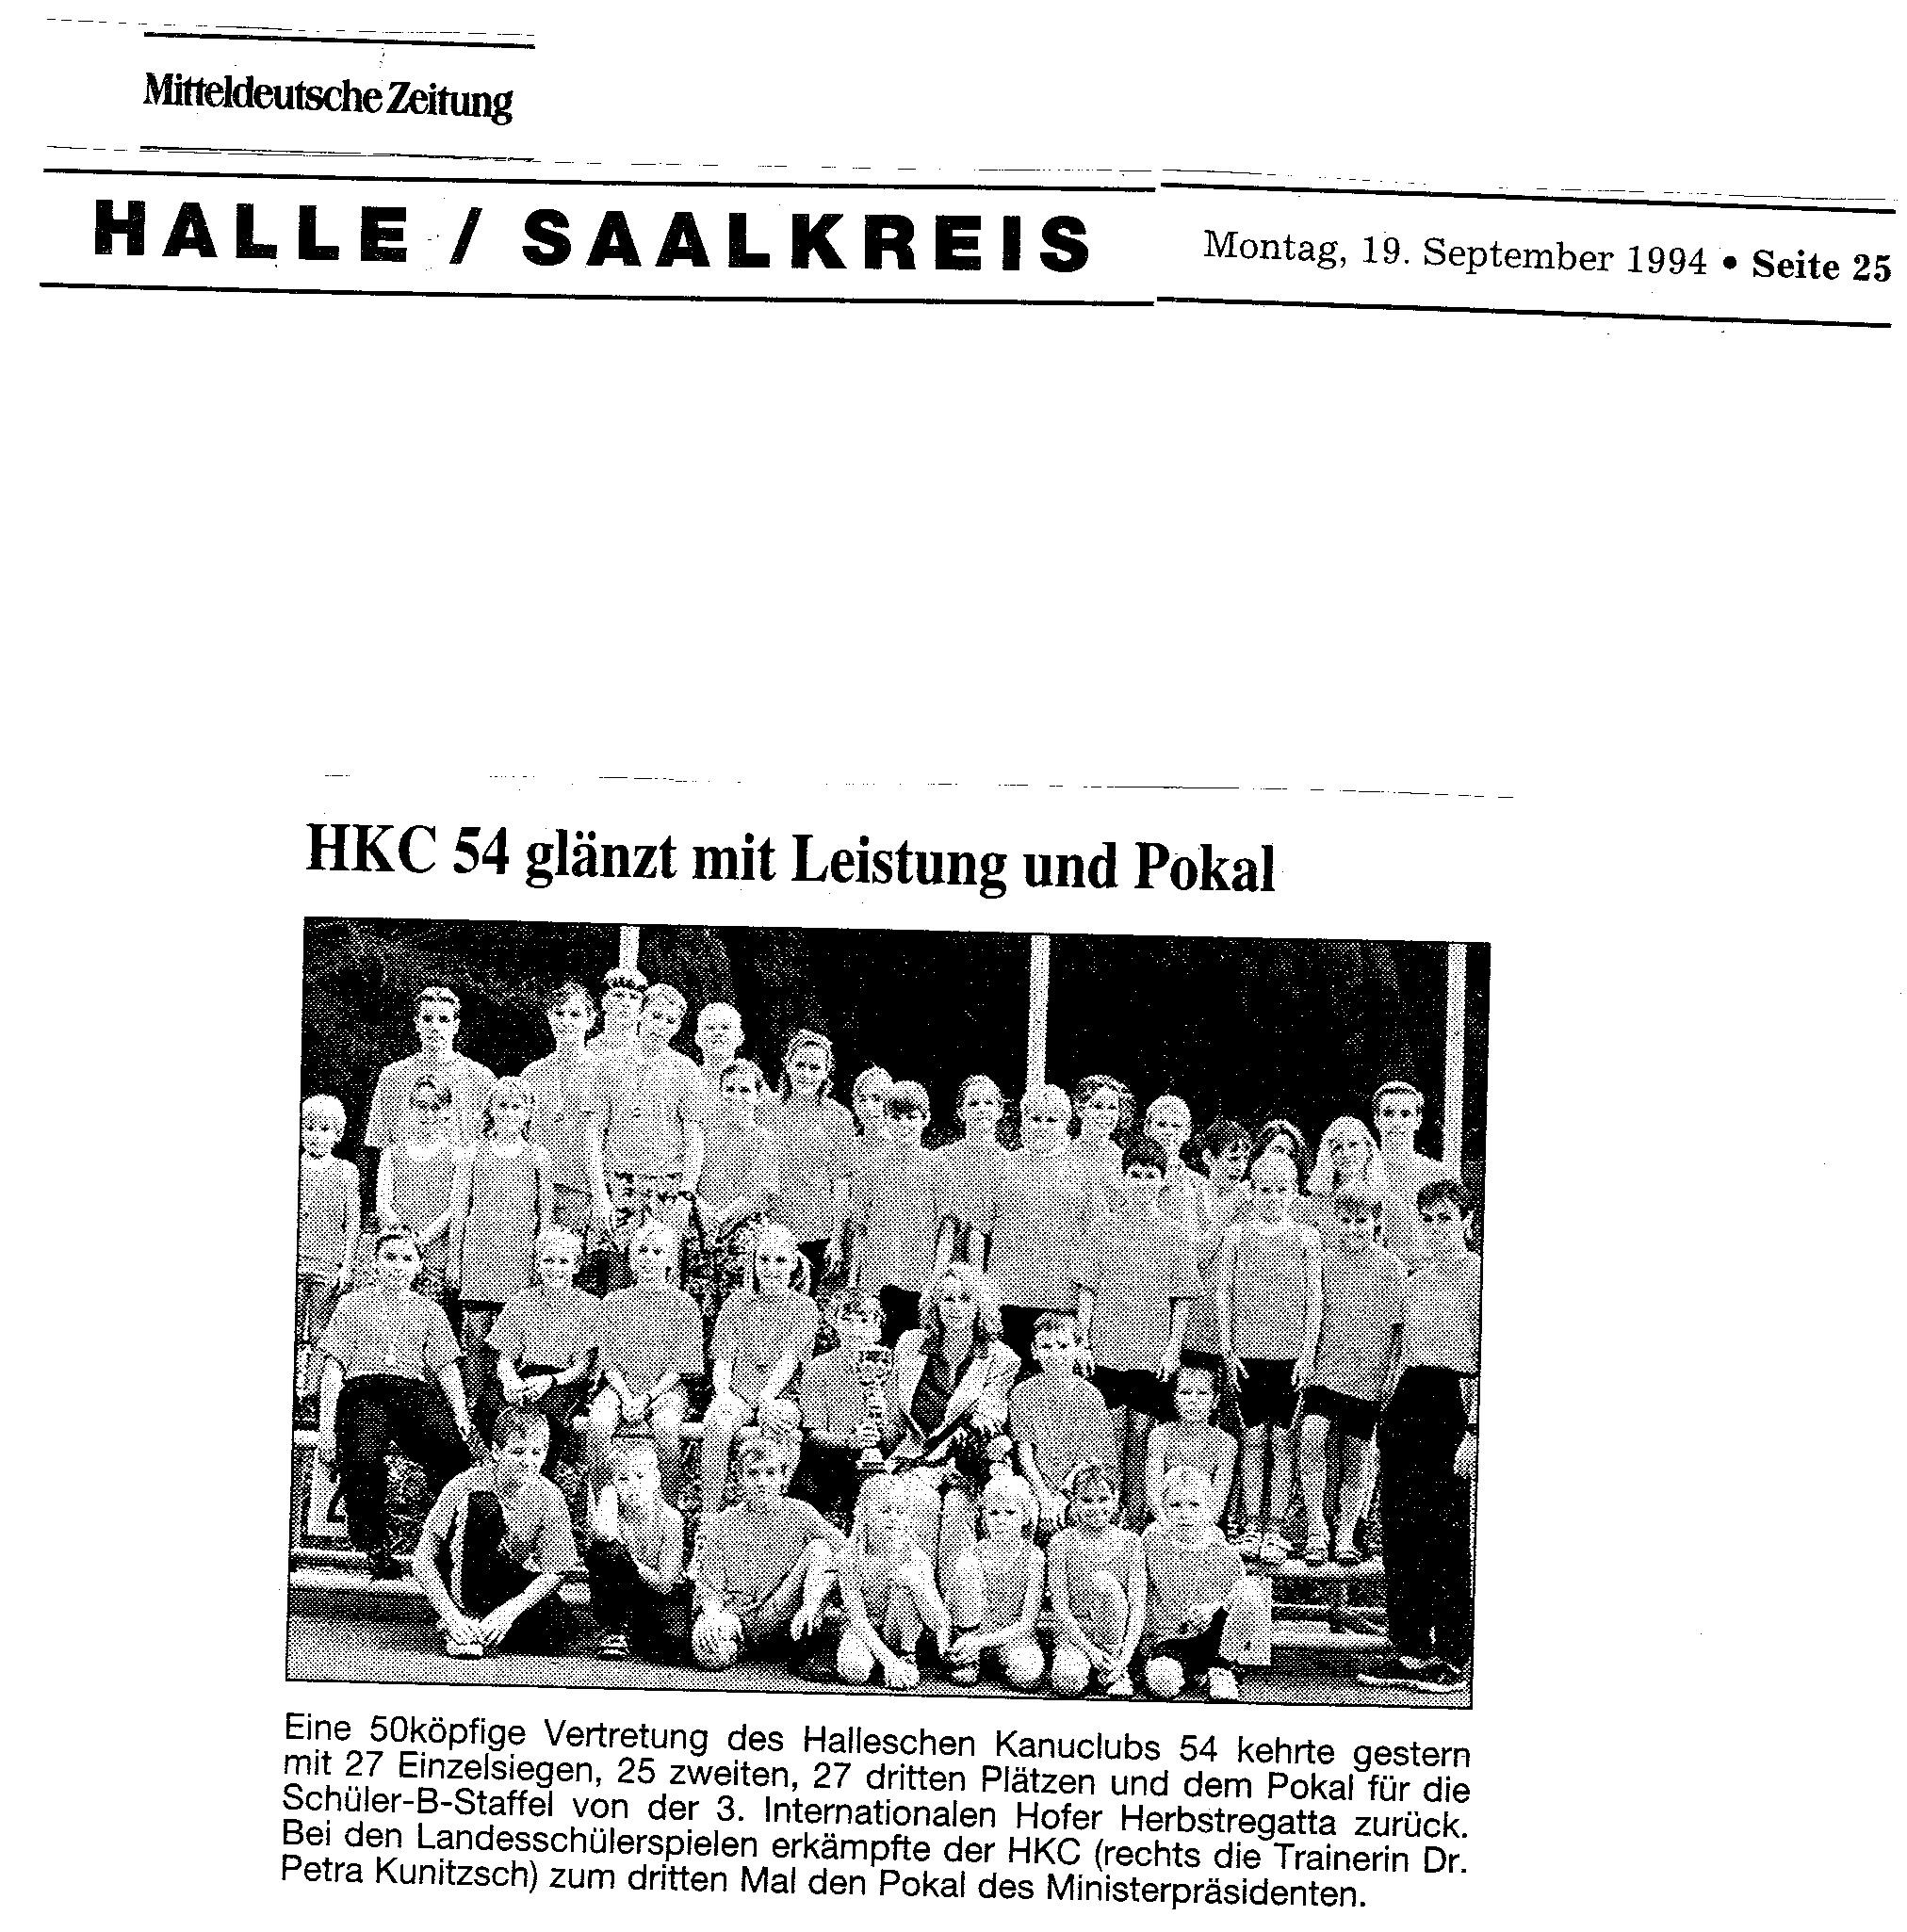 1994-09-19 MZ HKC 54 glänzt mit Leistung udn Pokal